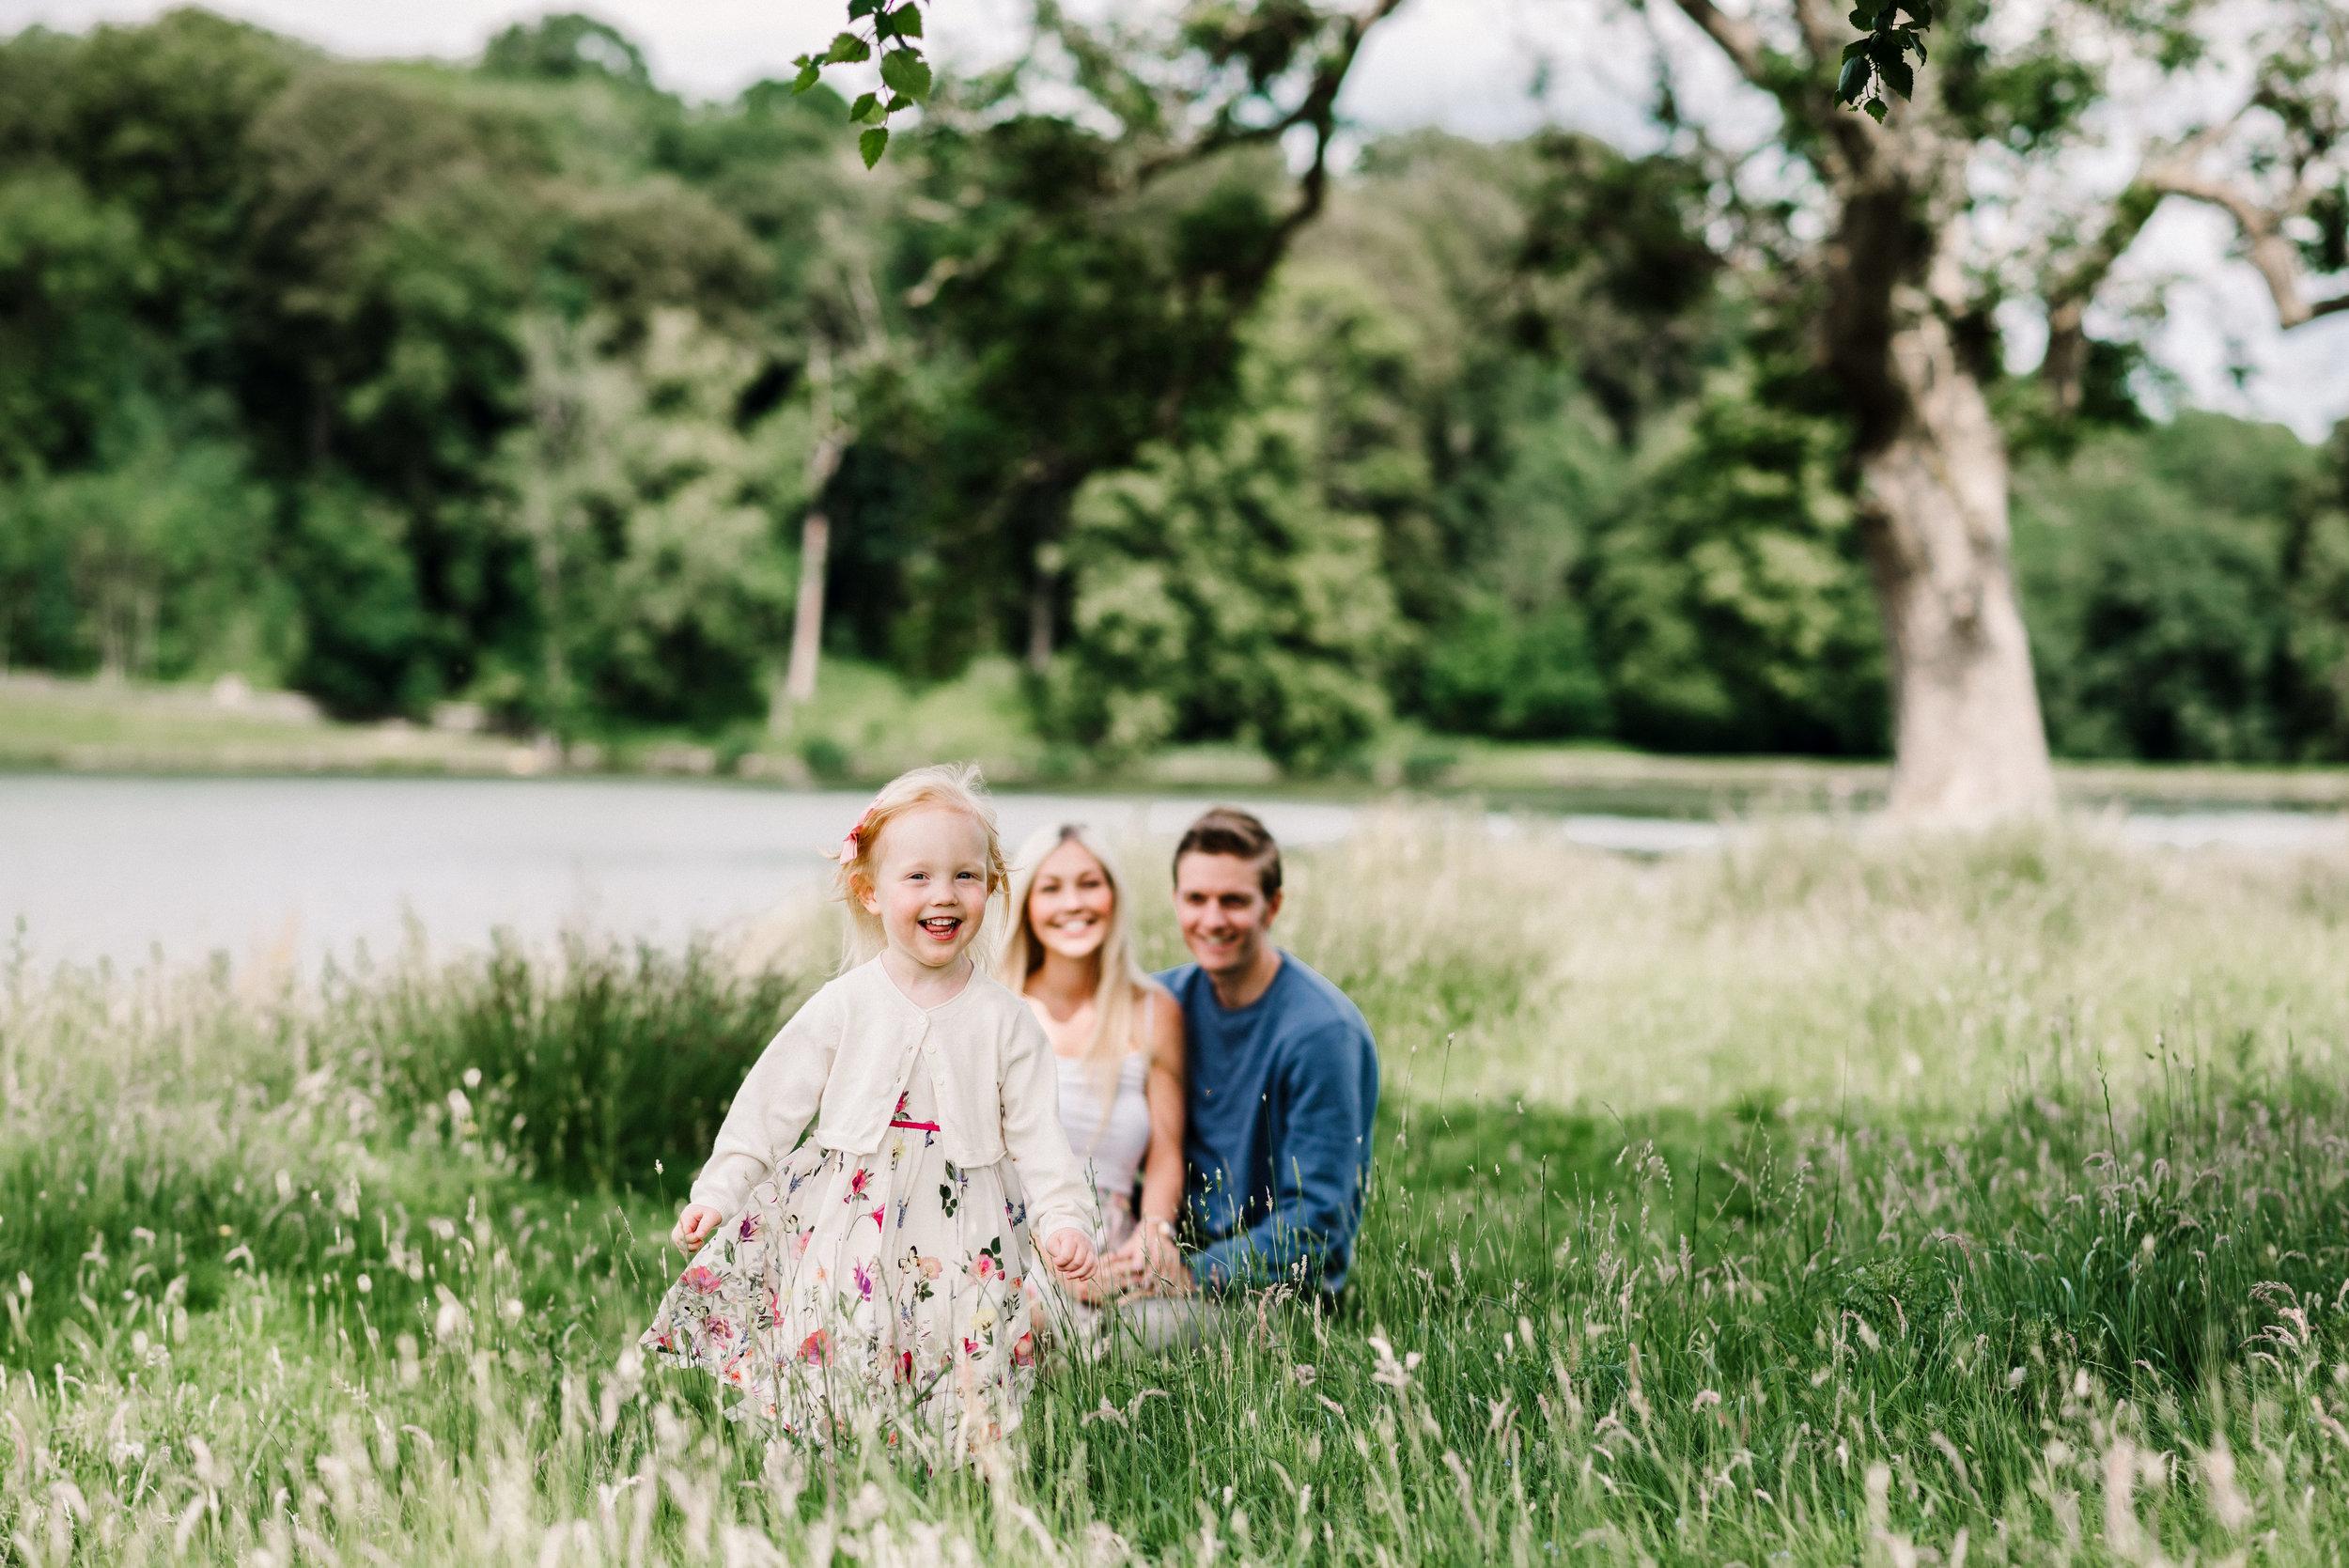 Family photographer, Lancashire.